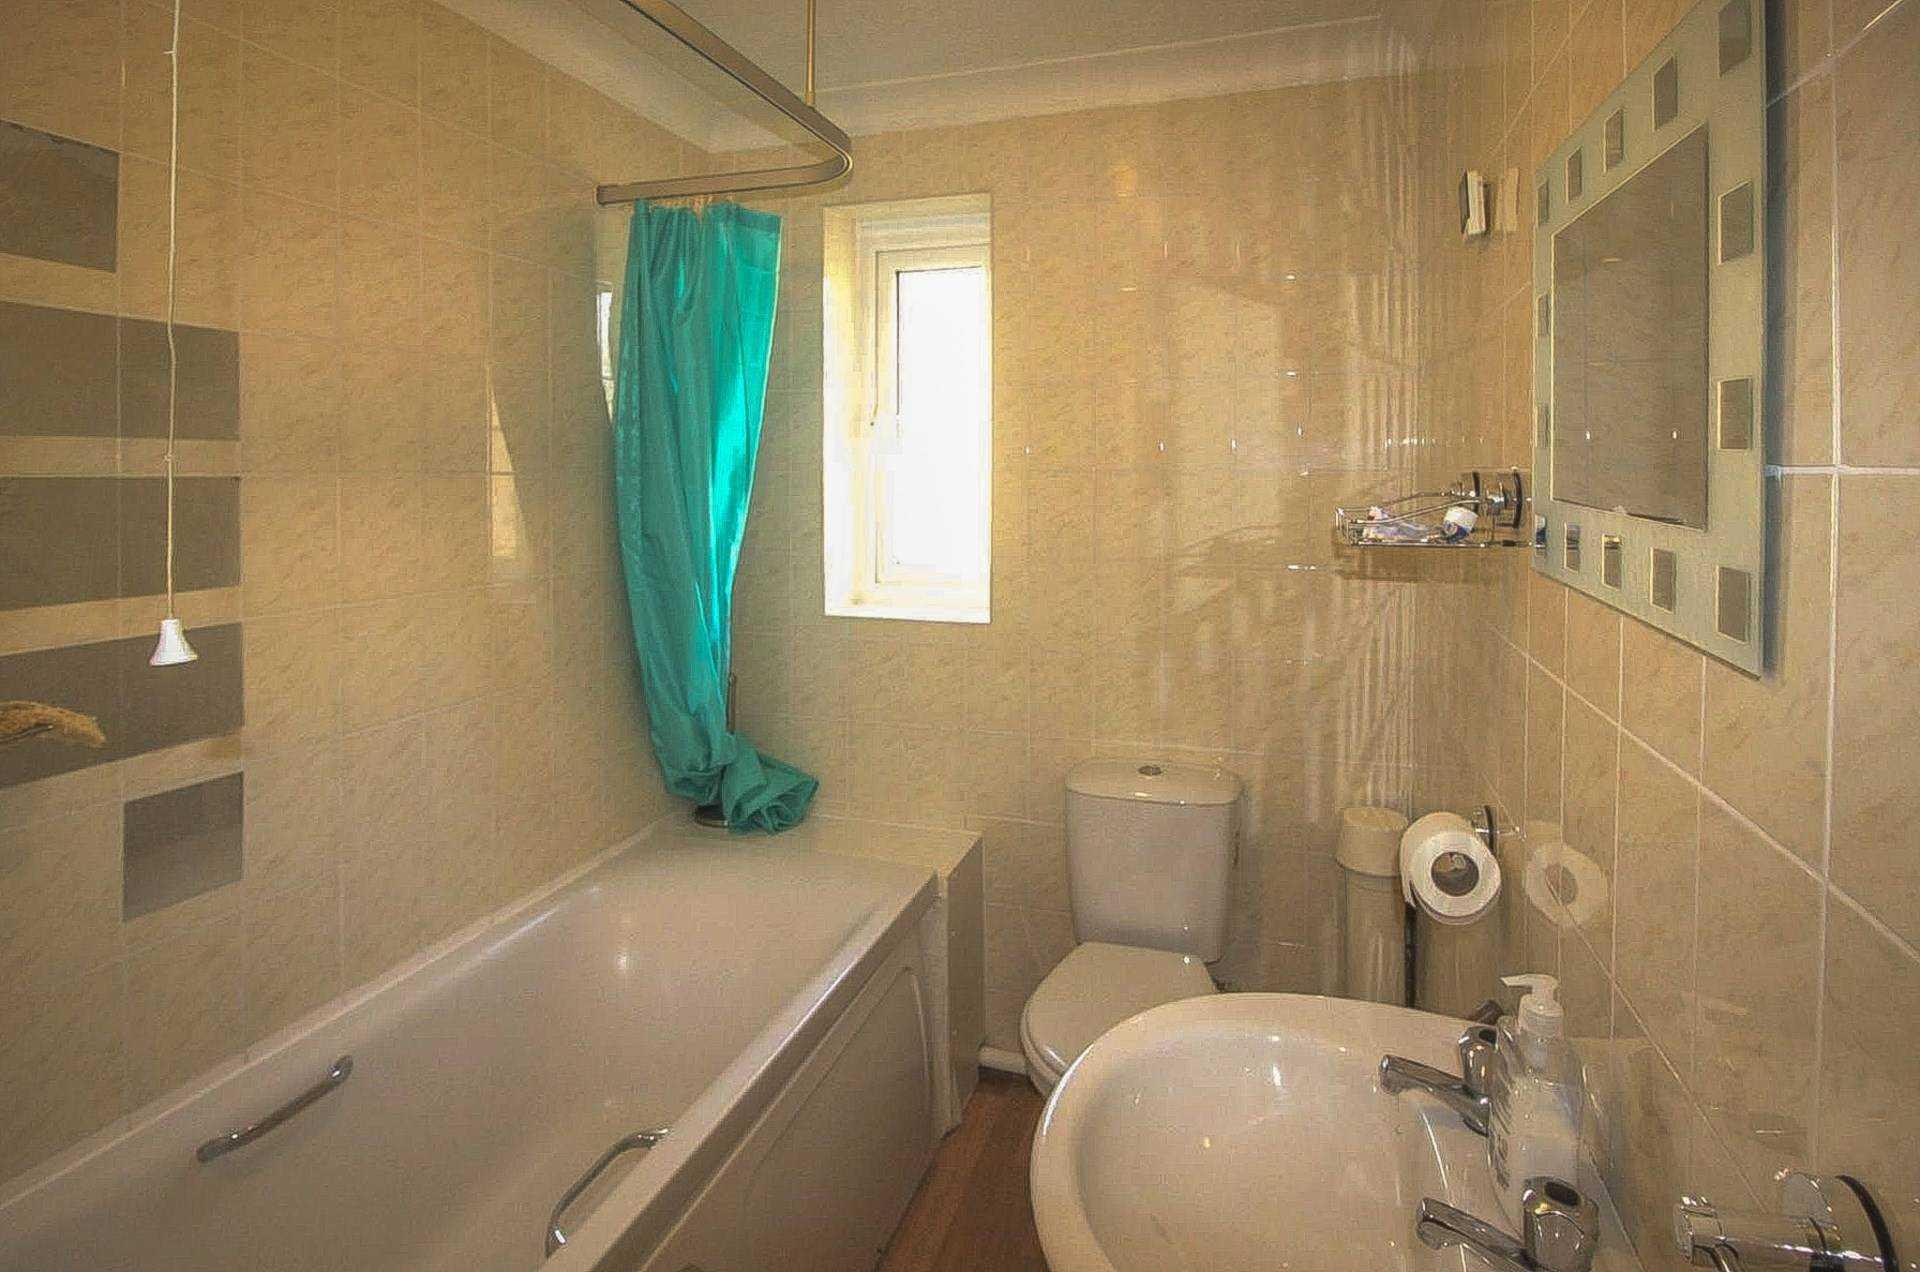 2 bed flat for sale in Dorset Mews, Dorset Street, Blandford Forum 4